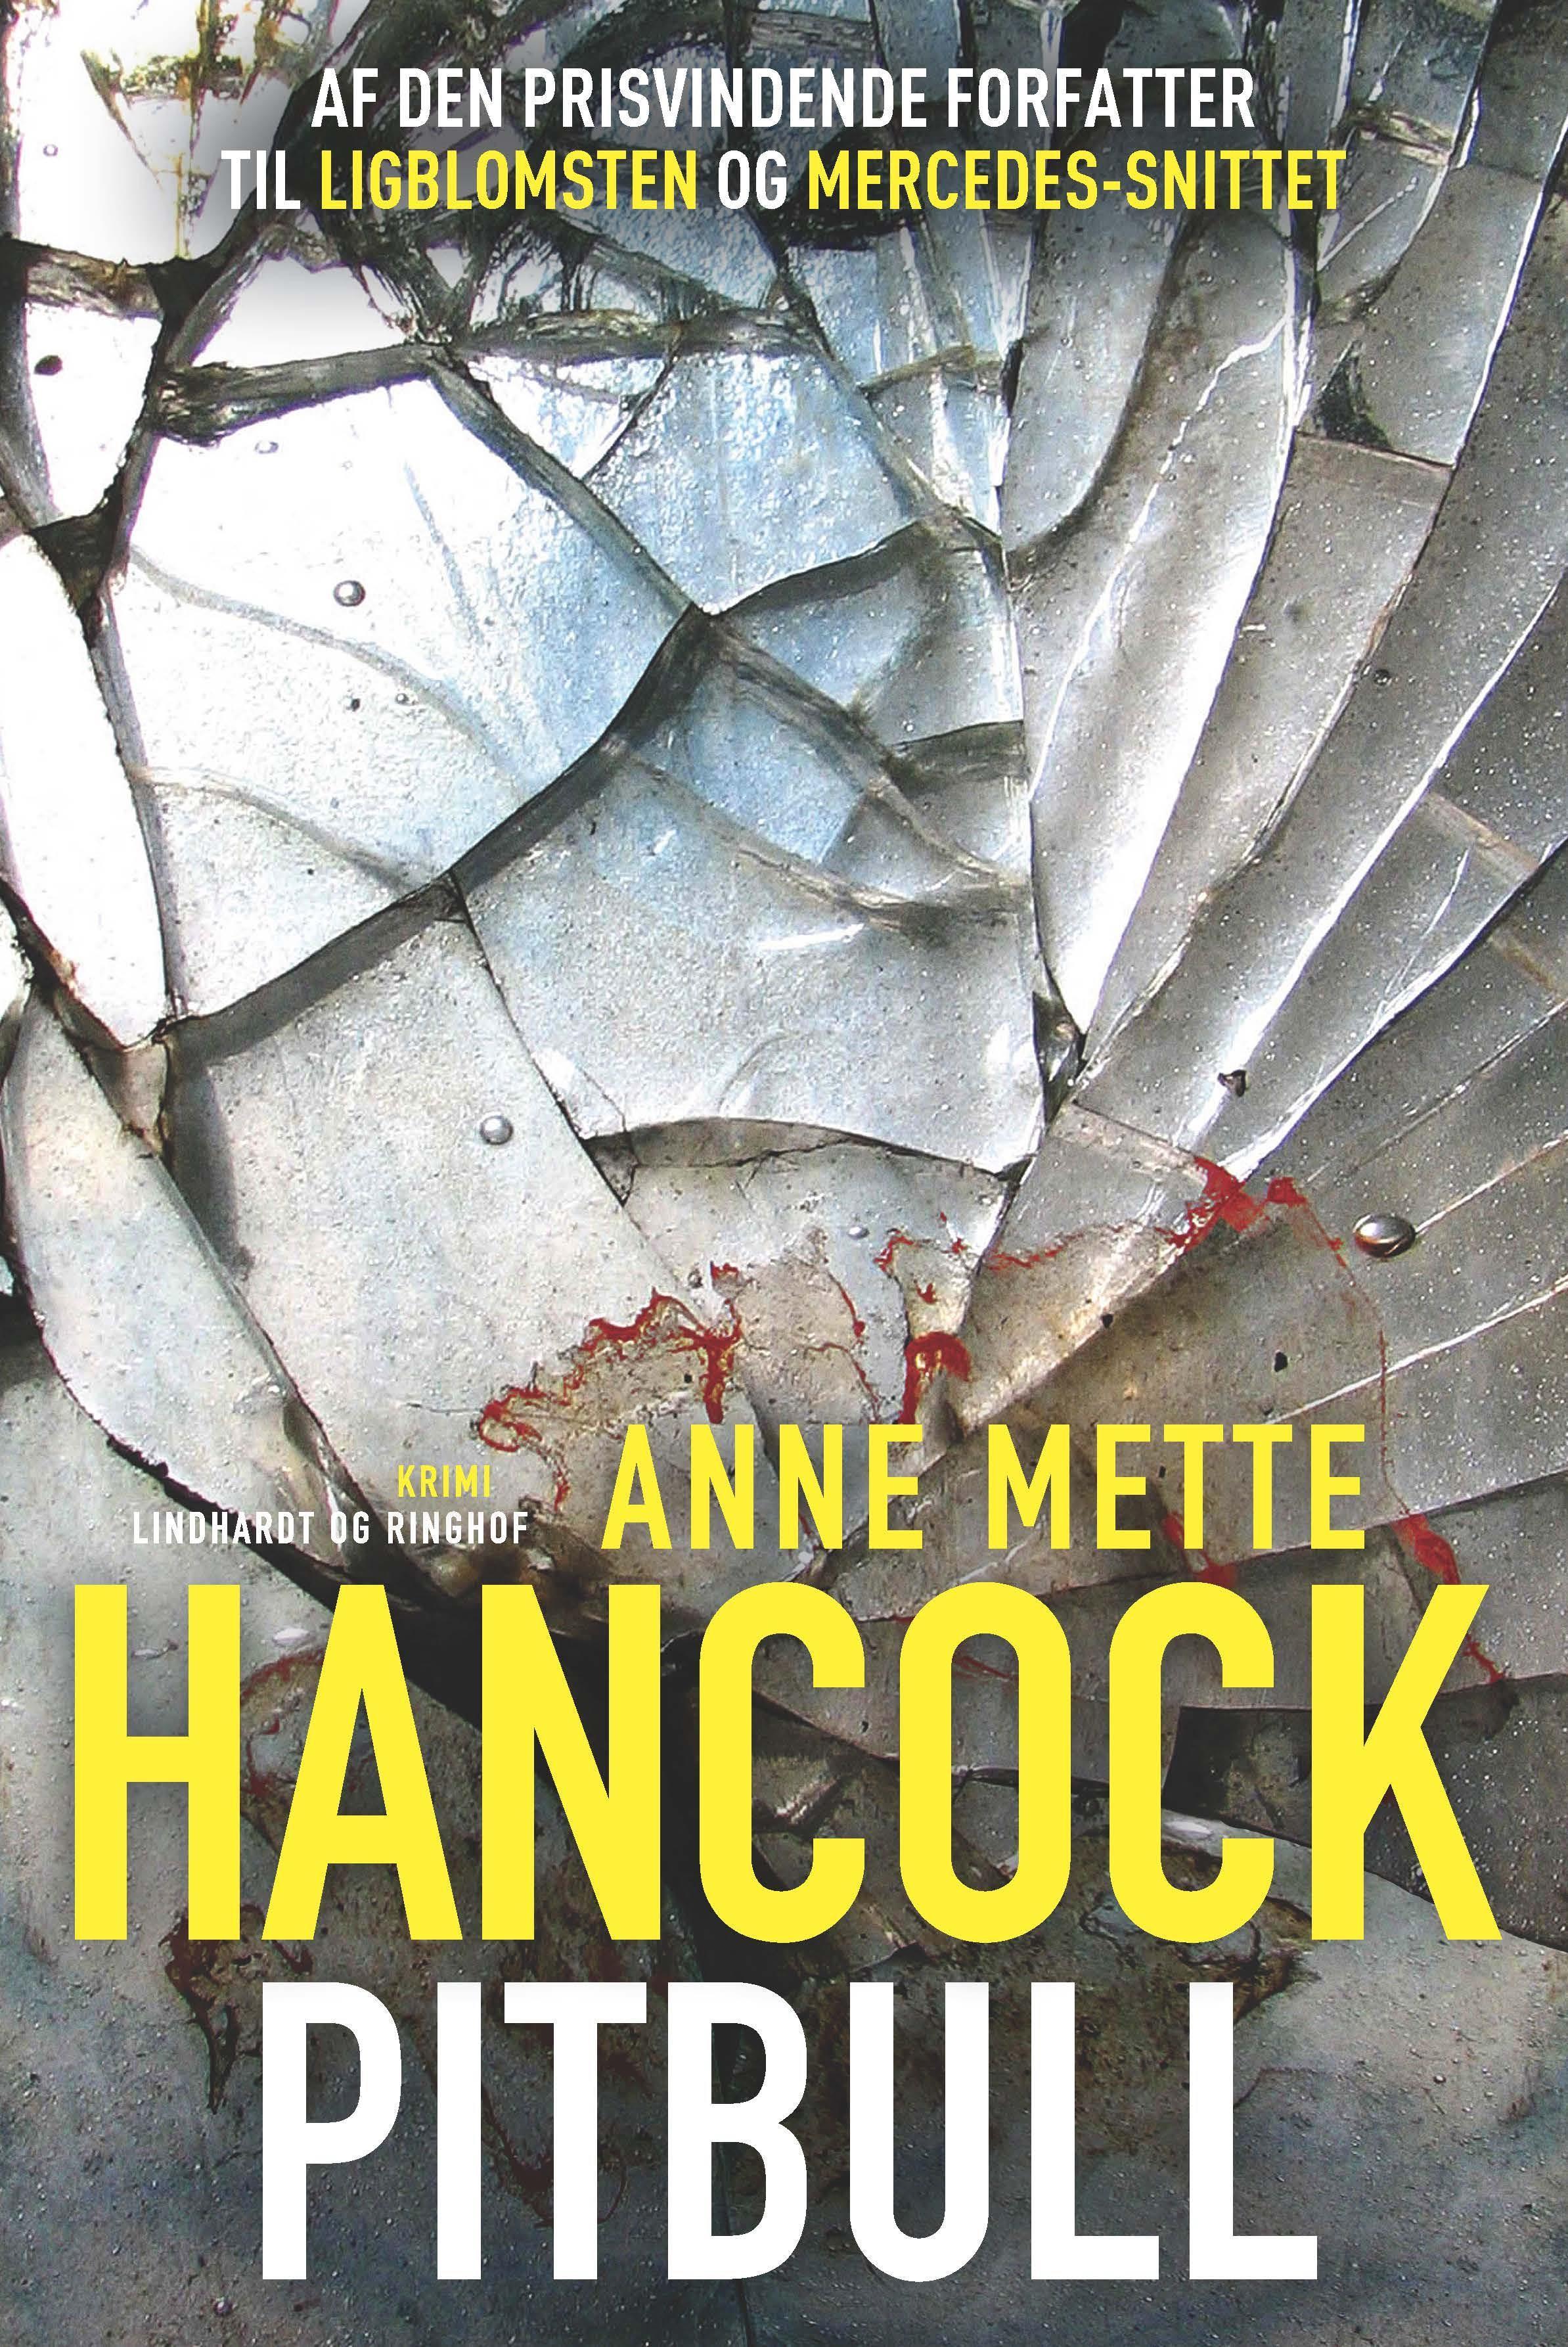 Pitbull - Anne Mette Hancock - Bøger - Lindhardt og Ringhof - 9788711693278 - 2/1-2020